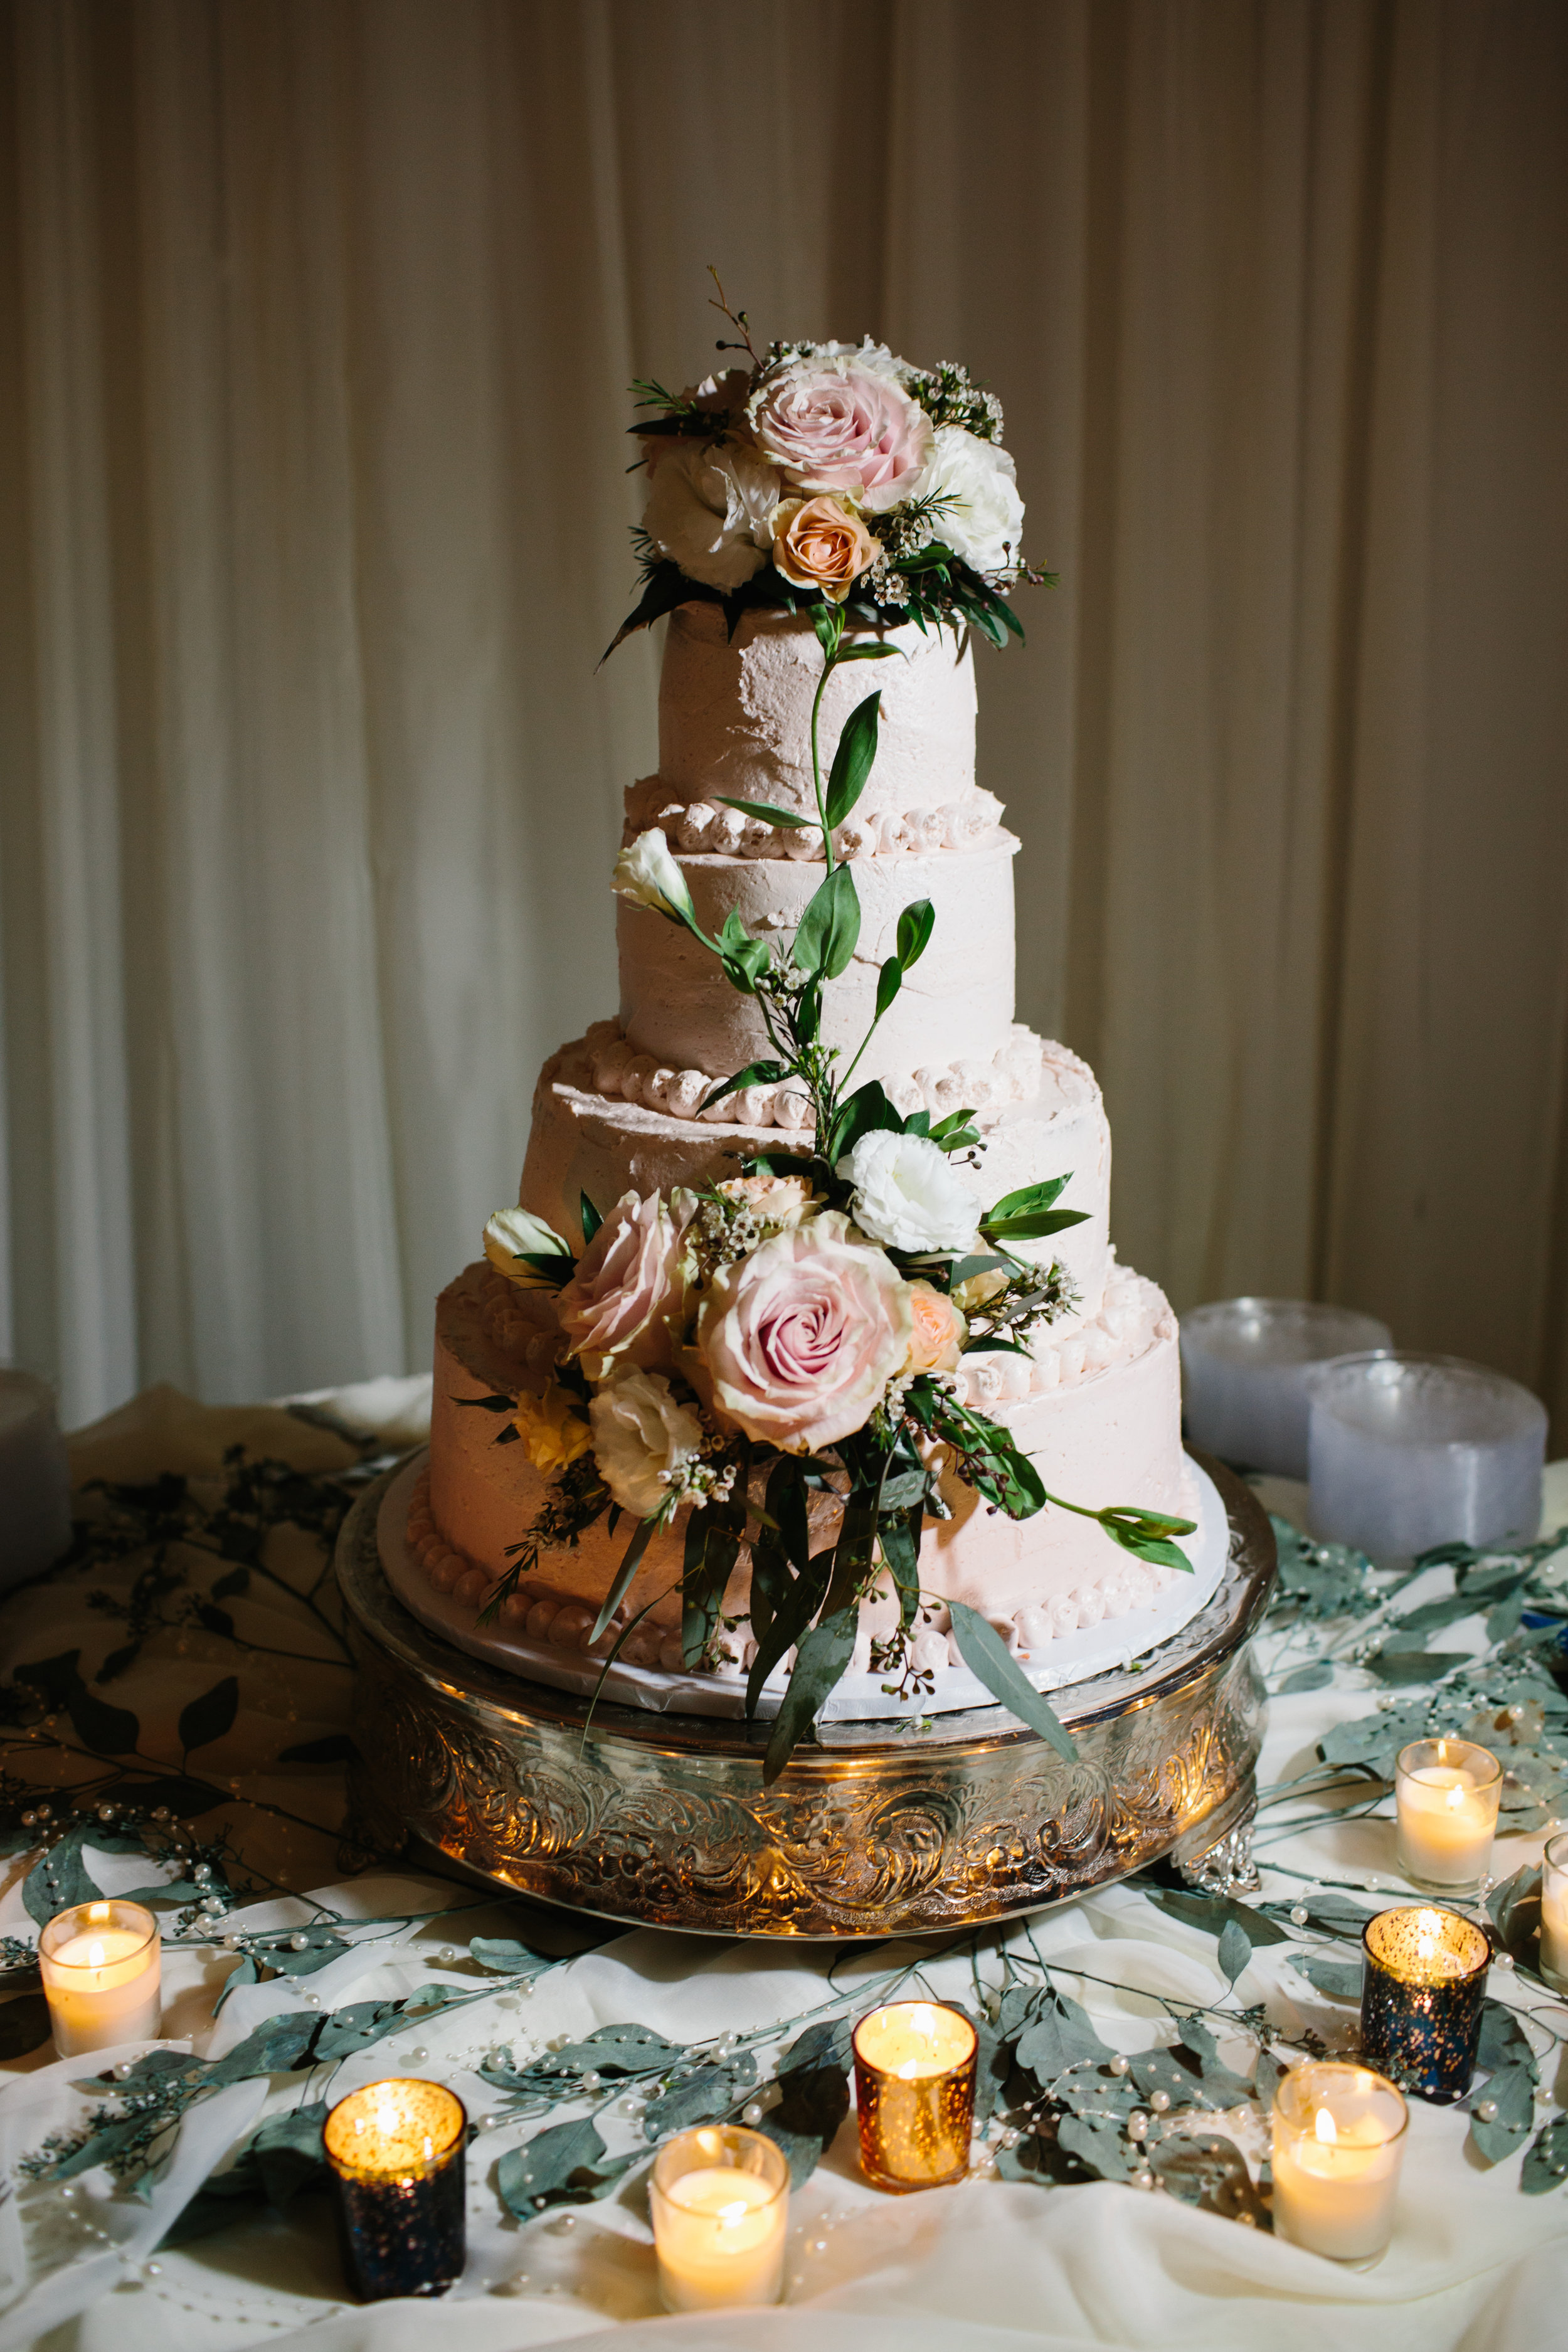 Lydia_johnathan_Wedding_Abigail_Malone_Photography-588.jpg